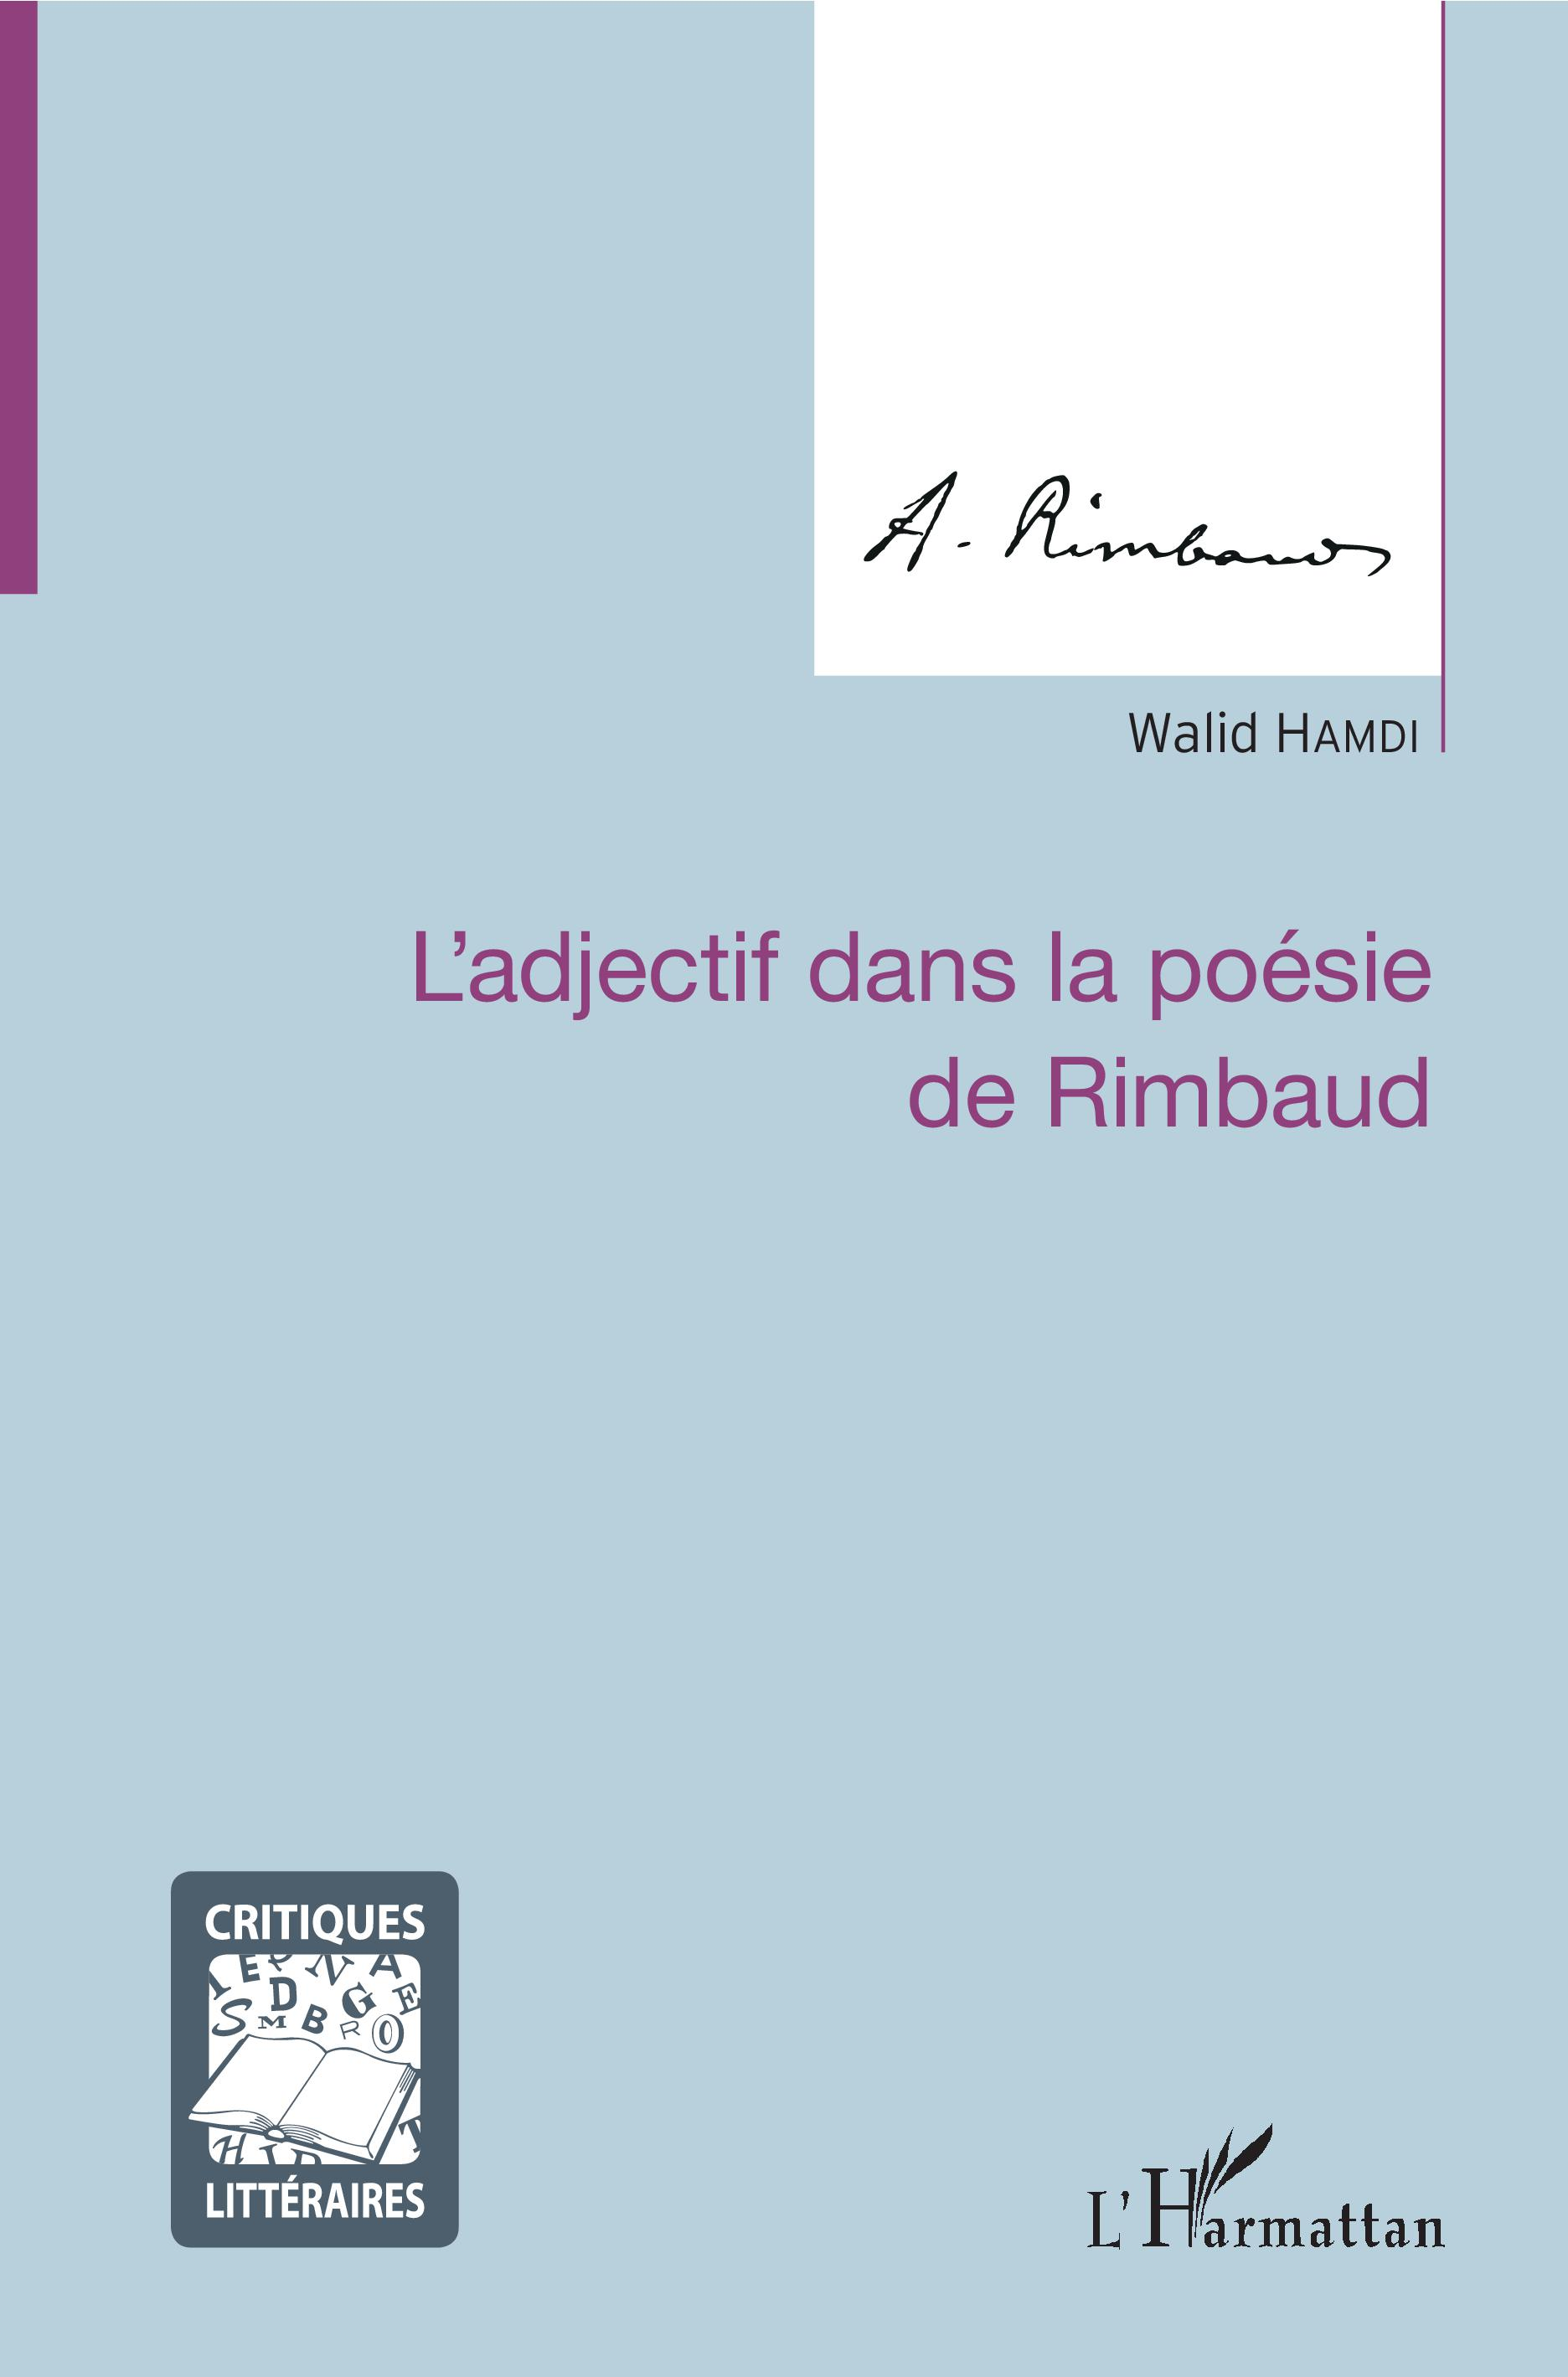 W. Hamdi, L'Adjectif dans la poésie de Rimbaud